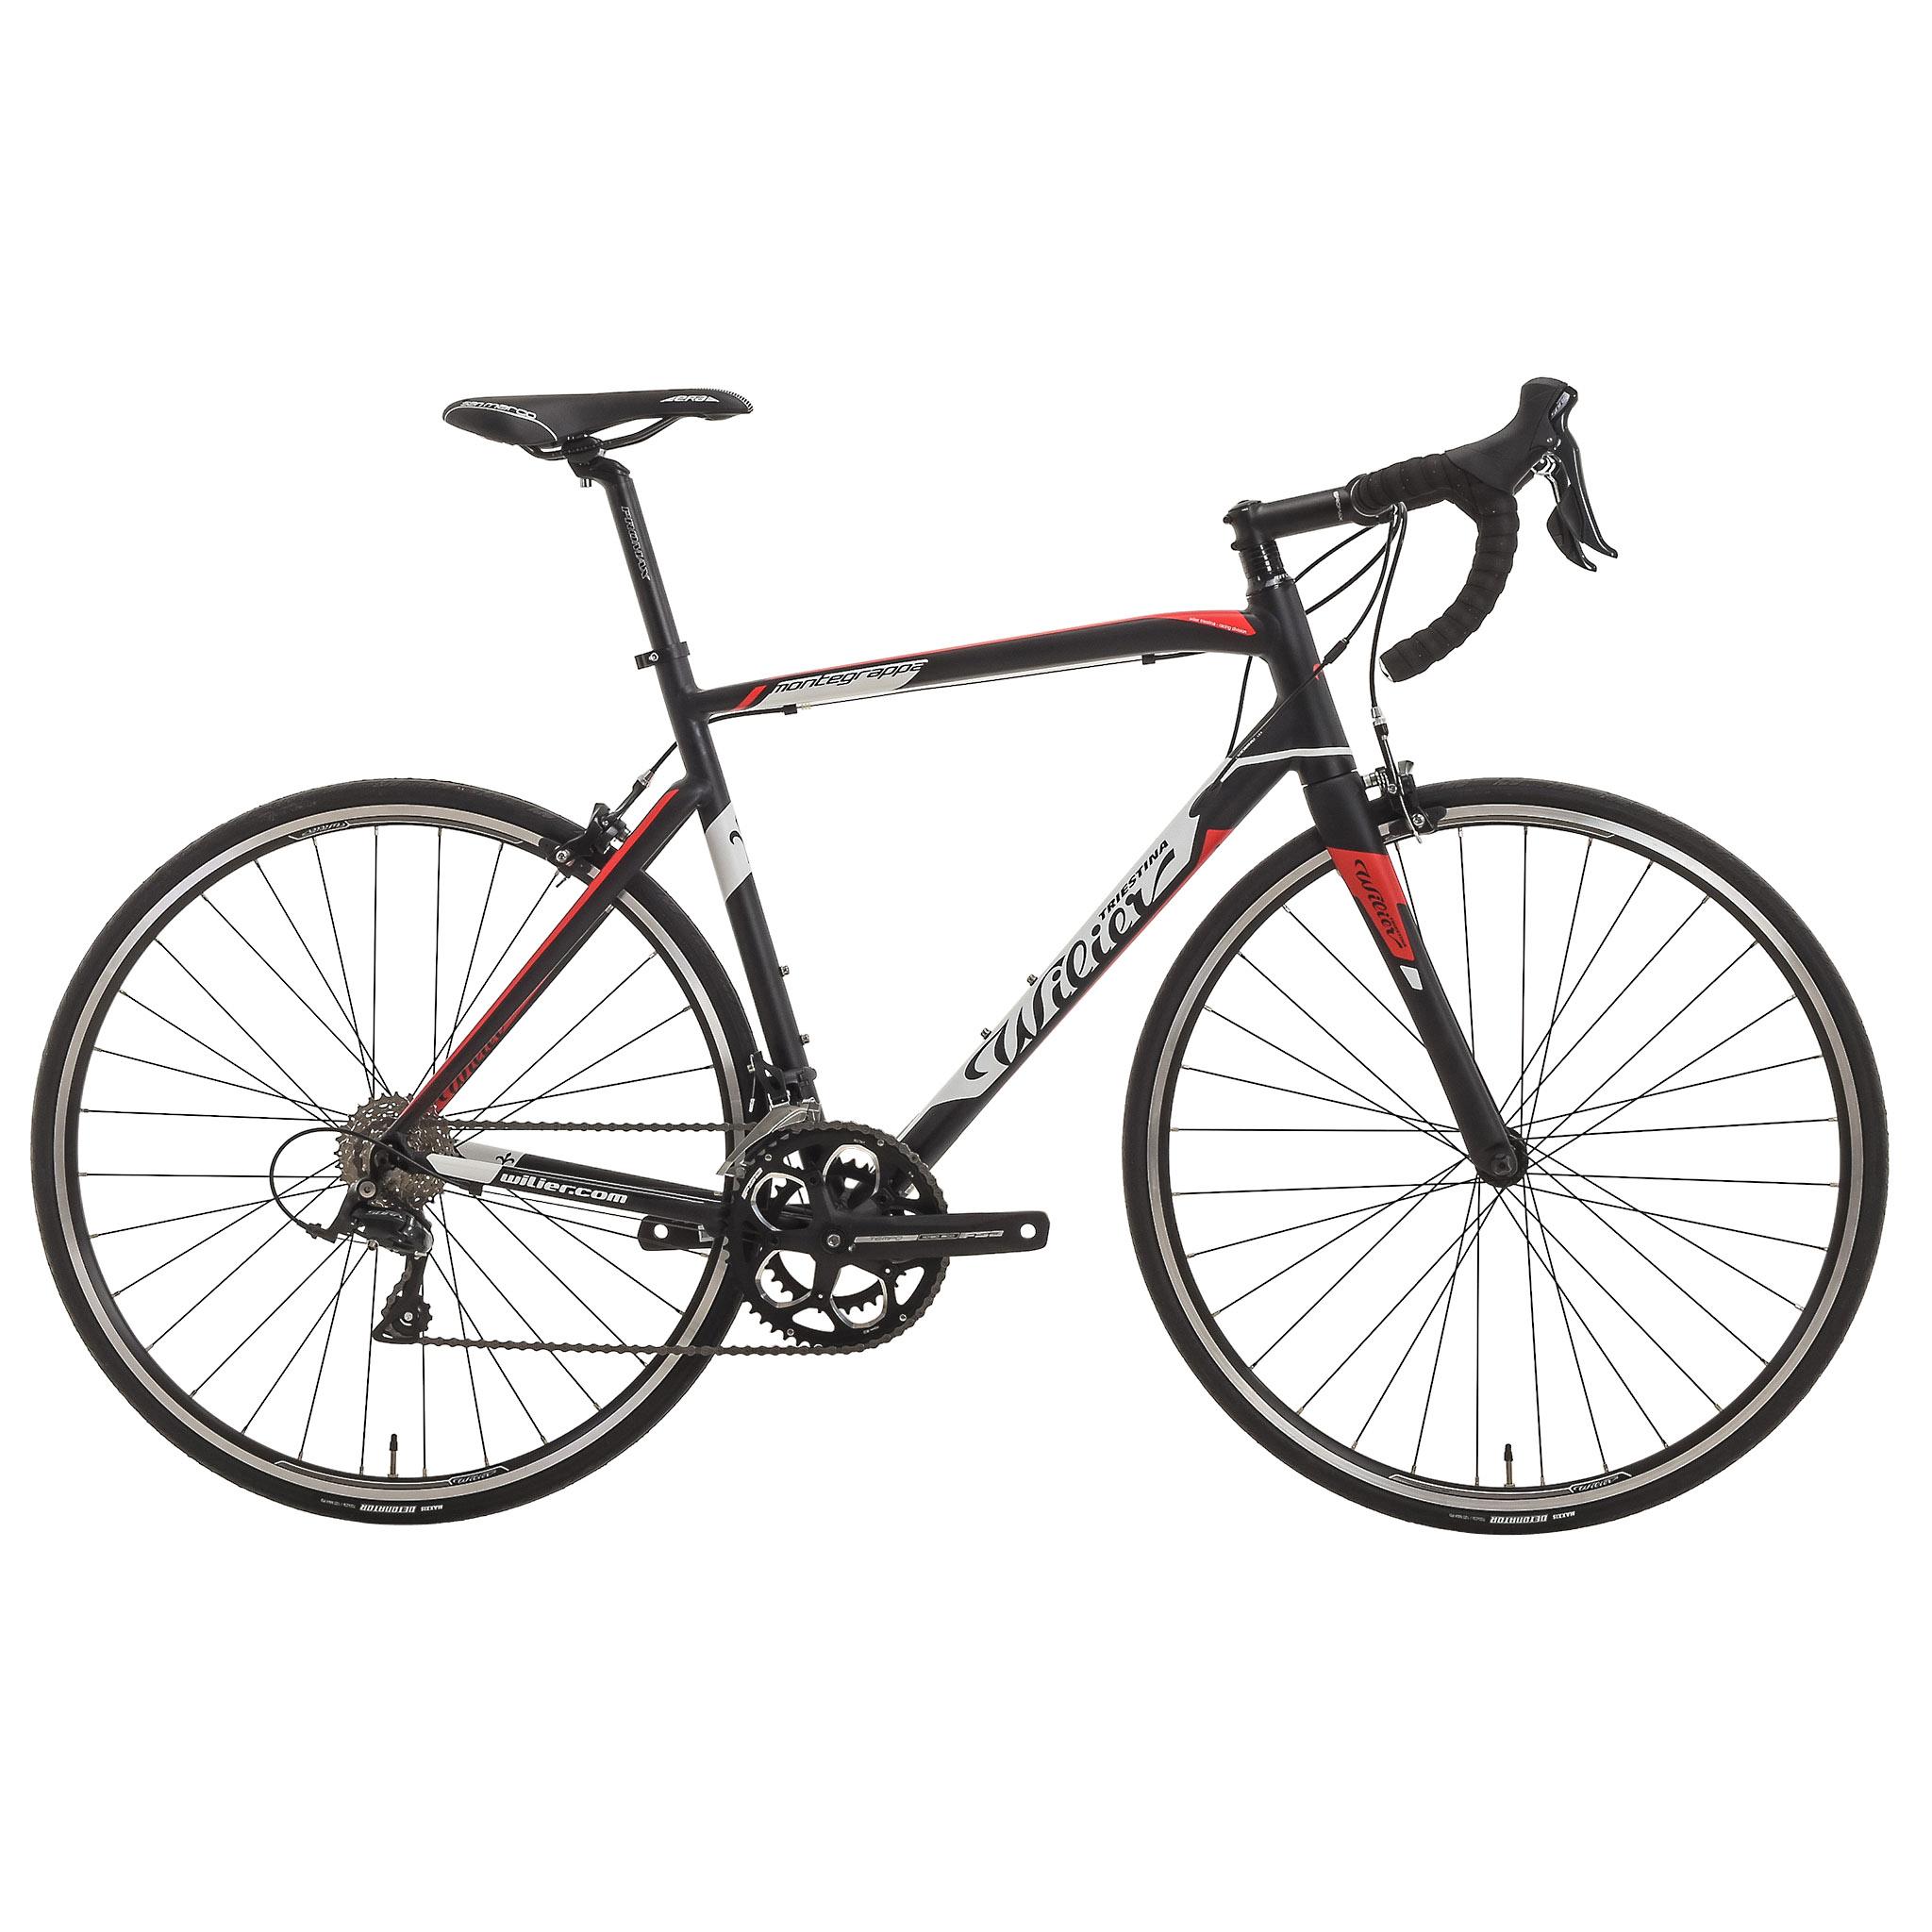 Bicicleta de carrera WILIER TRIESTINA MONTEGRAPPA Shimano Sora 3500 34/50 Negro 2017